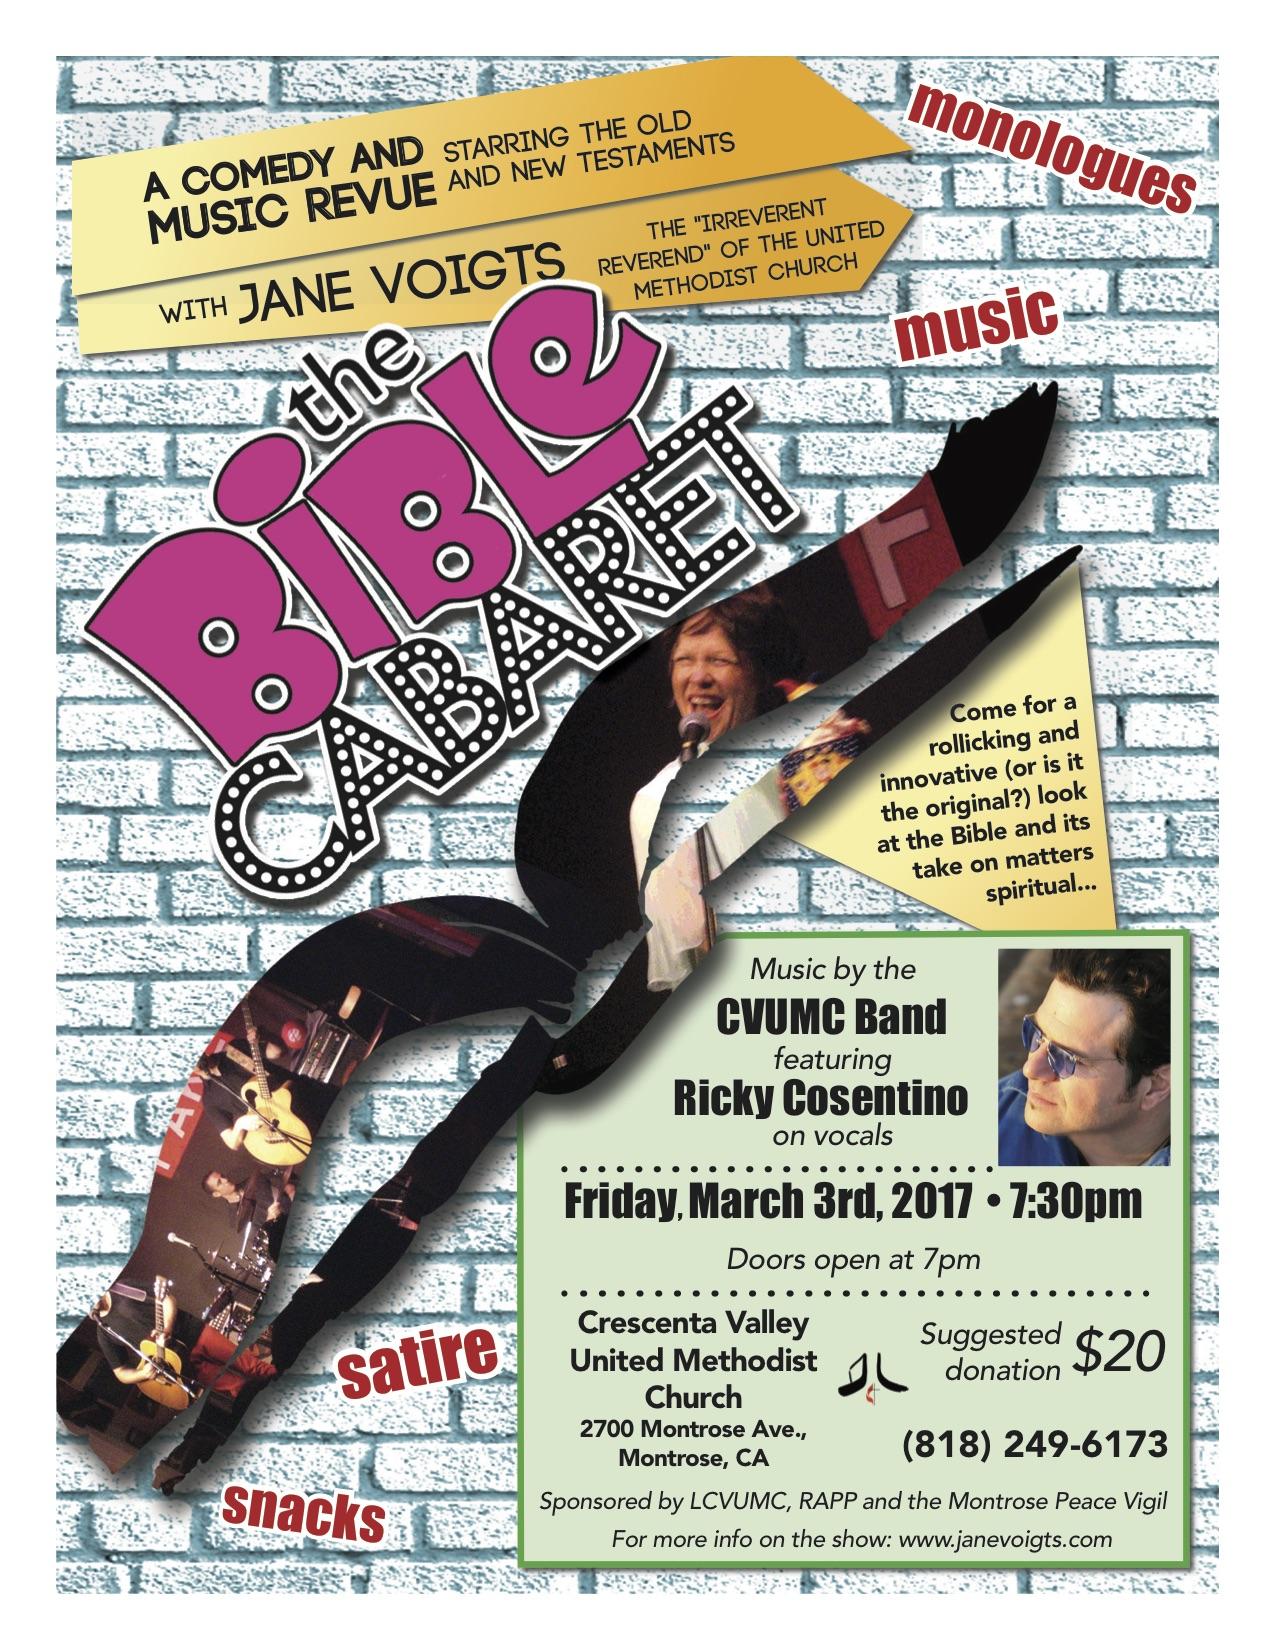 Bible Cabaret 8.5x11 Crescenta Valley UMC Flyer-6 copy.jpg